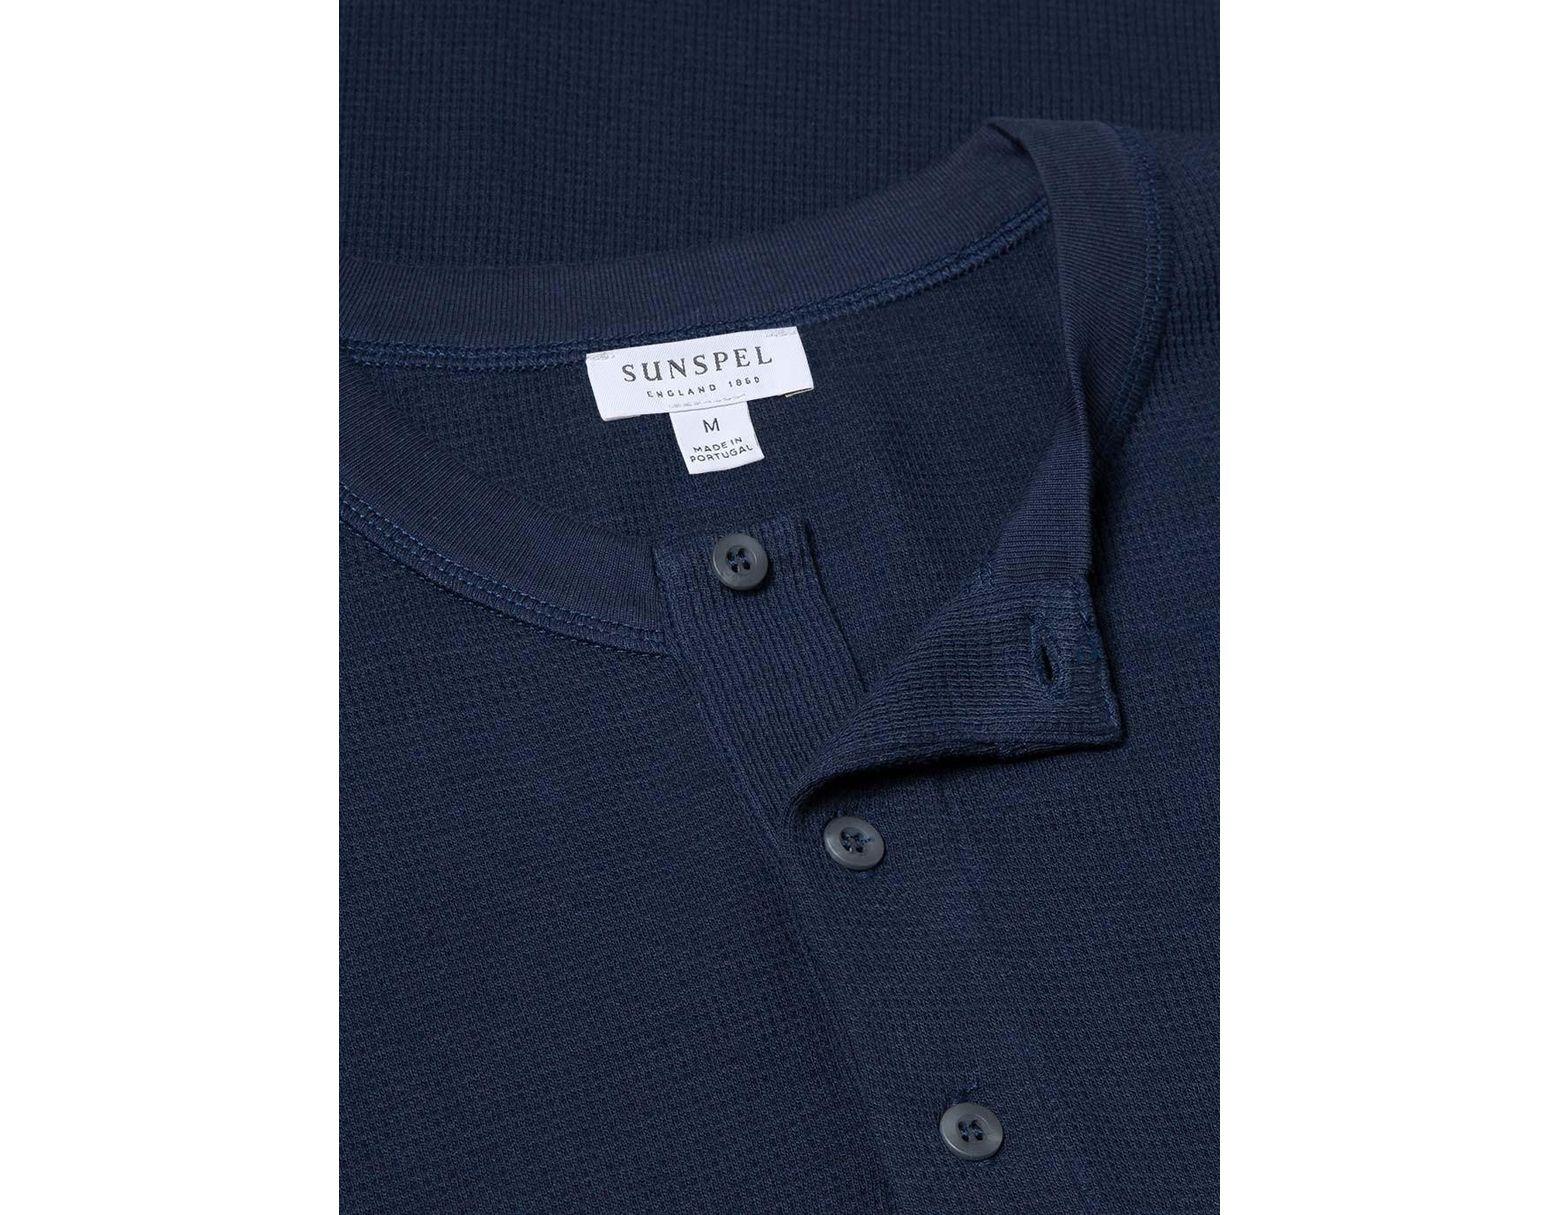 ebb545a1c3 Sunspel Men's Cotton Waffle Long Sleeve Henley In Navy in Blue for Men -  Save 60% - Lyst